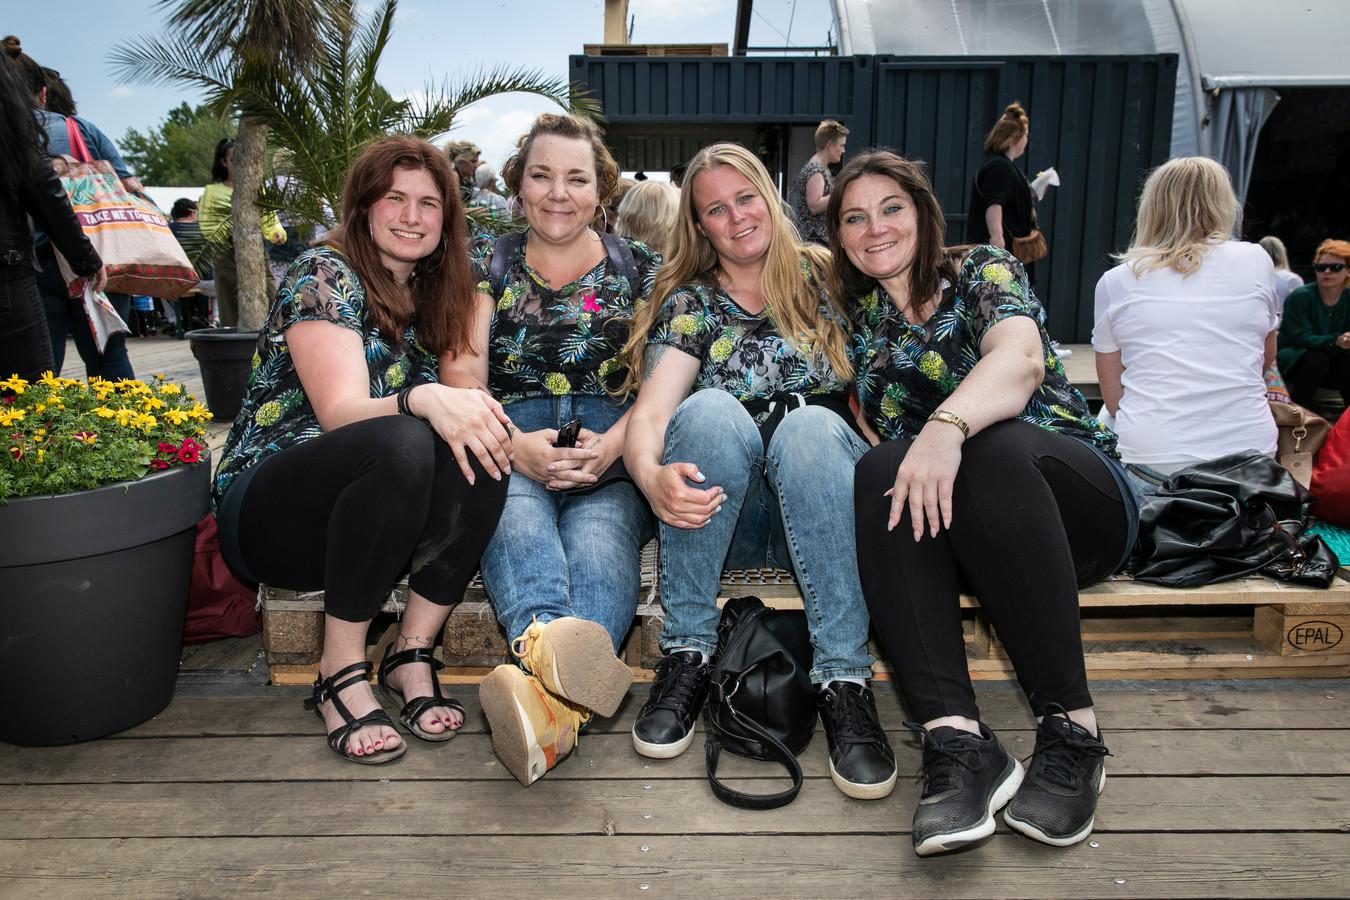 Vriendinnengroep op de Libelle Zomerweek. Vlnr: Ingrid Thomas (26), Marianne Bekebrede (40), Marjan de Jong (38) en Diana Greve (40).